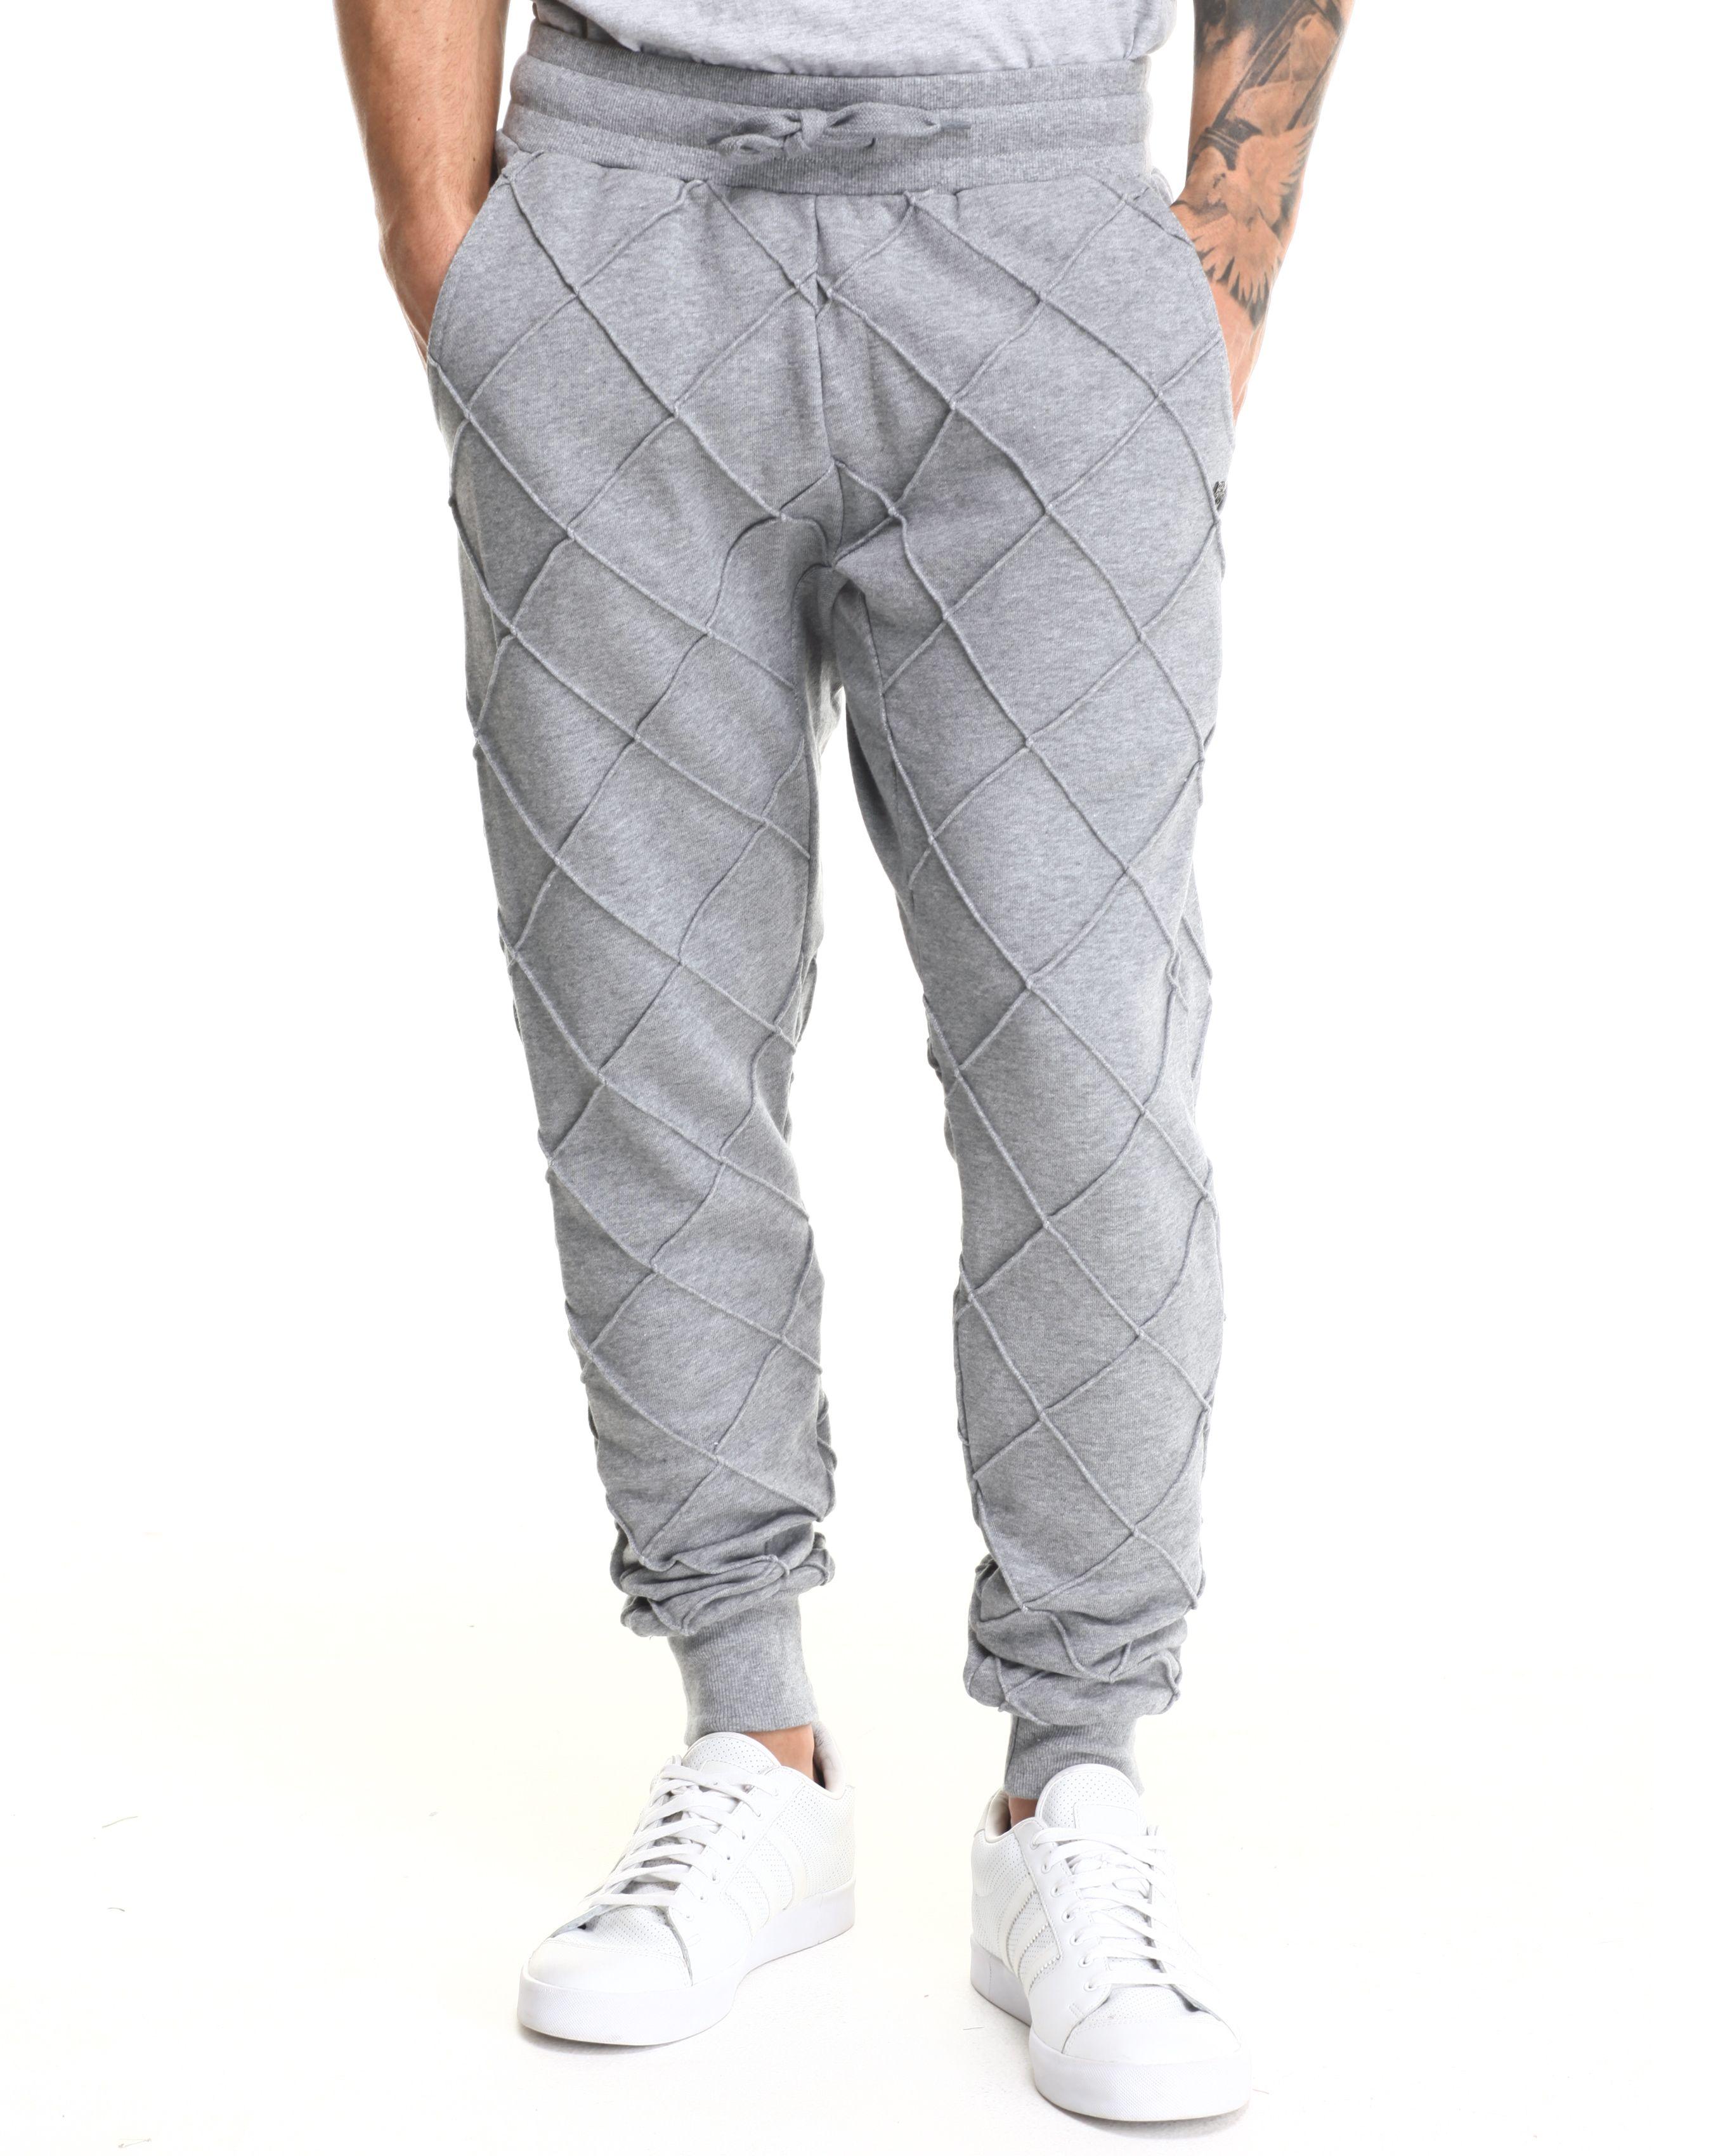 Kilos Jogger Men s Jeans   Pants from Rocksmith.  ac6d90002387